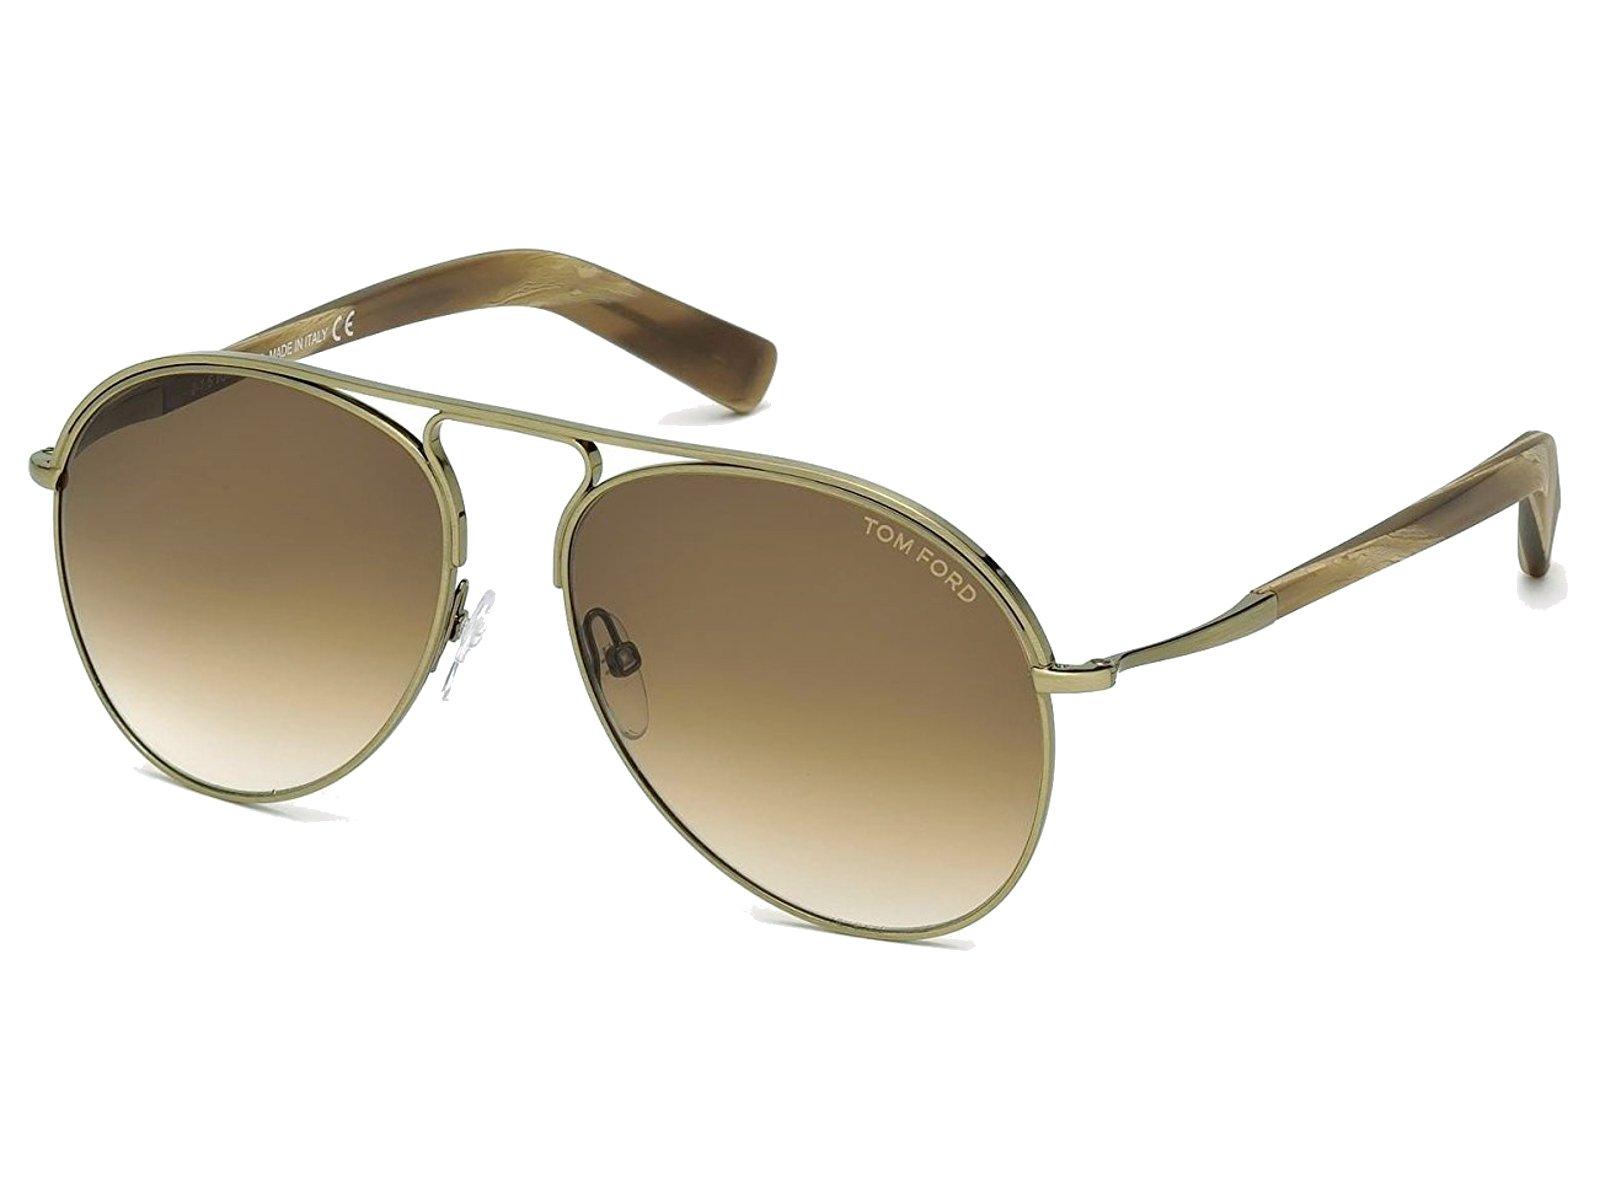 Tom Ford TF0666 Tripp Aviator Sunglasses 58mm